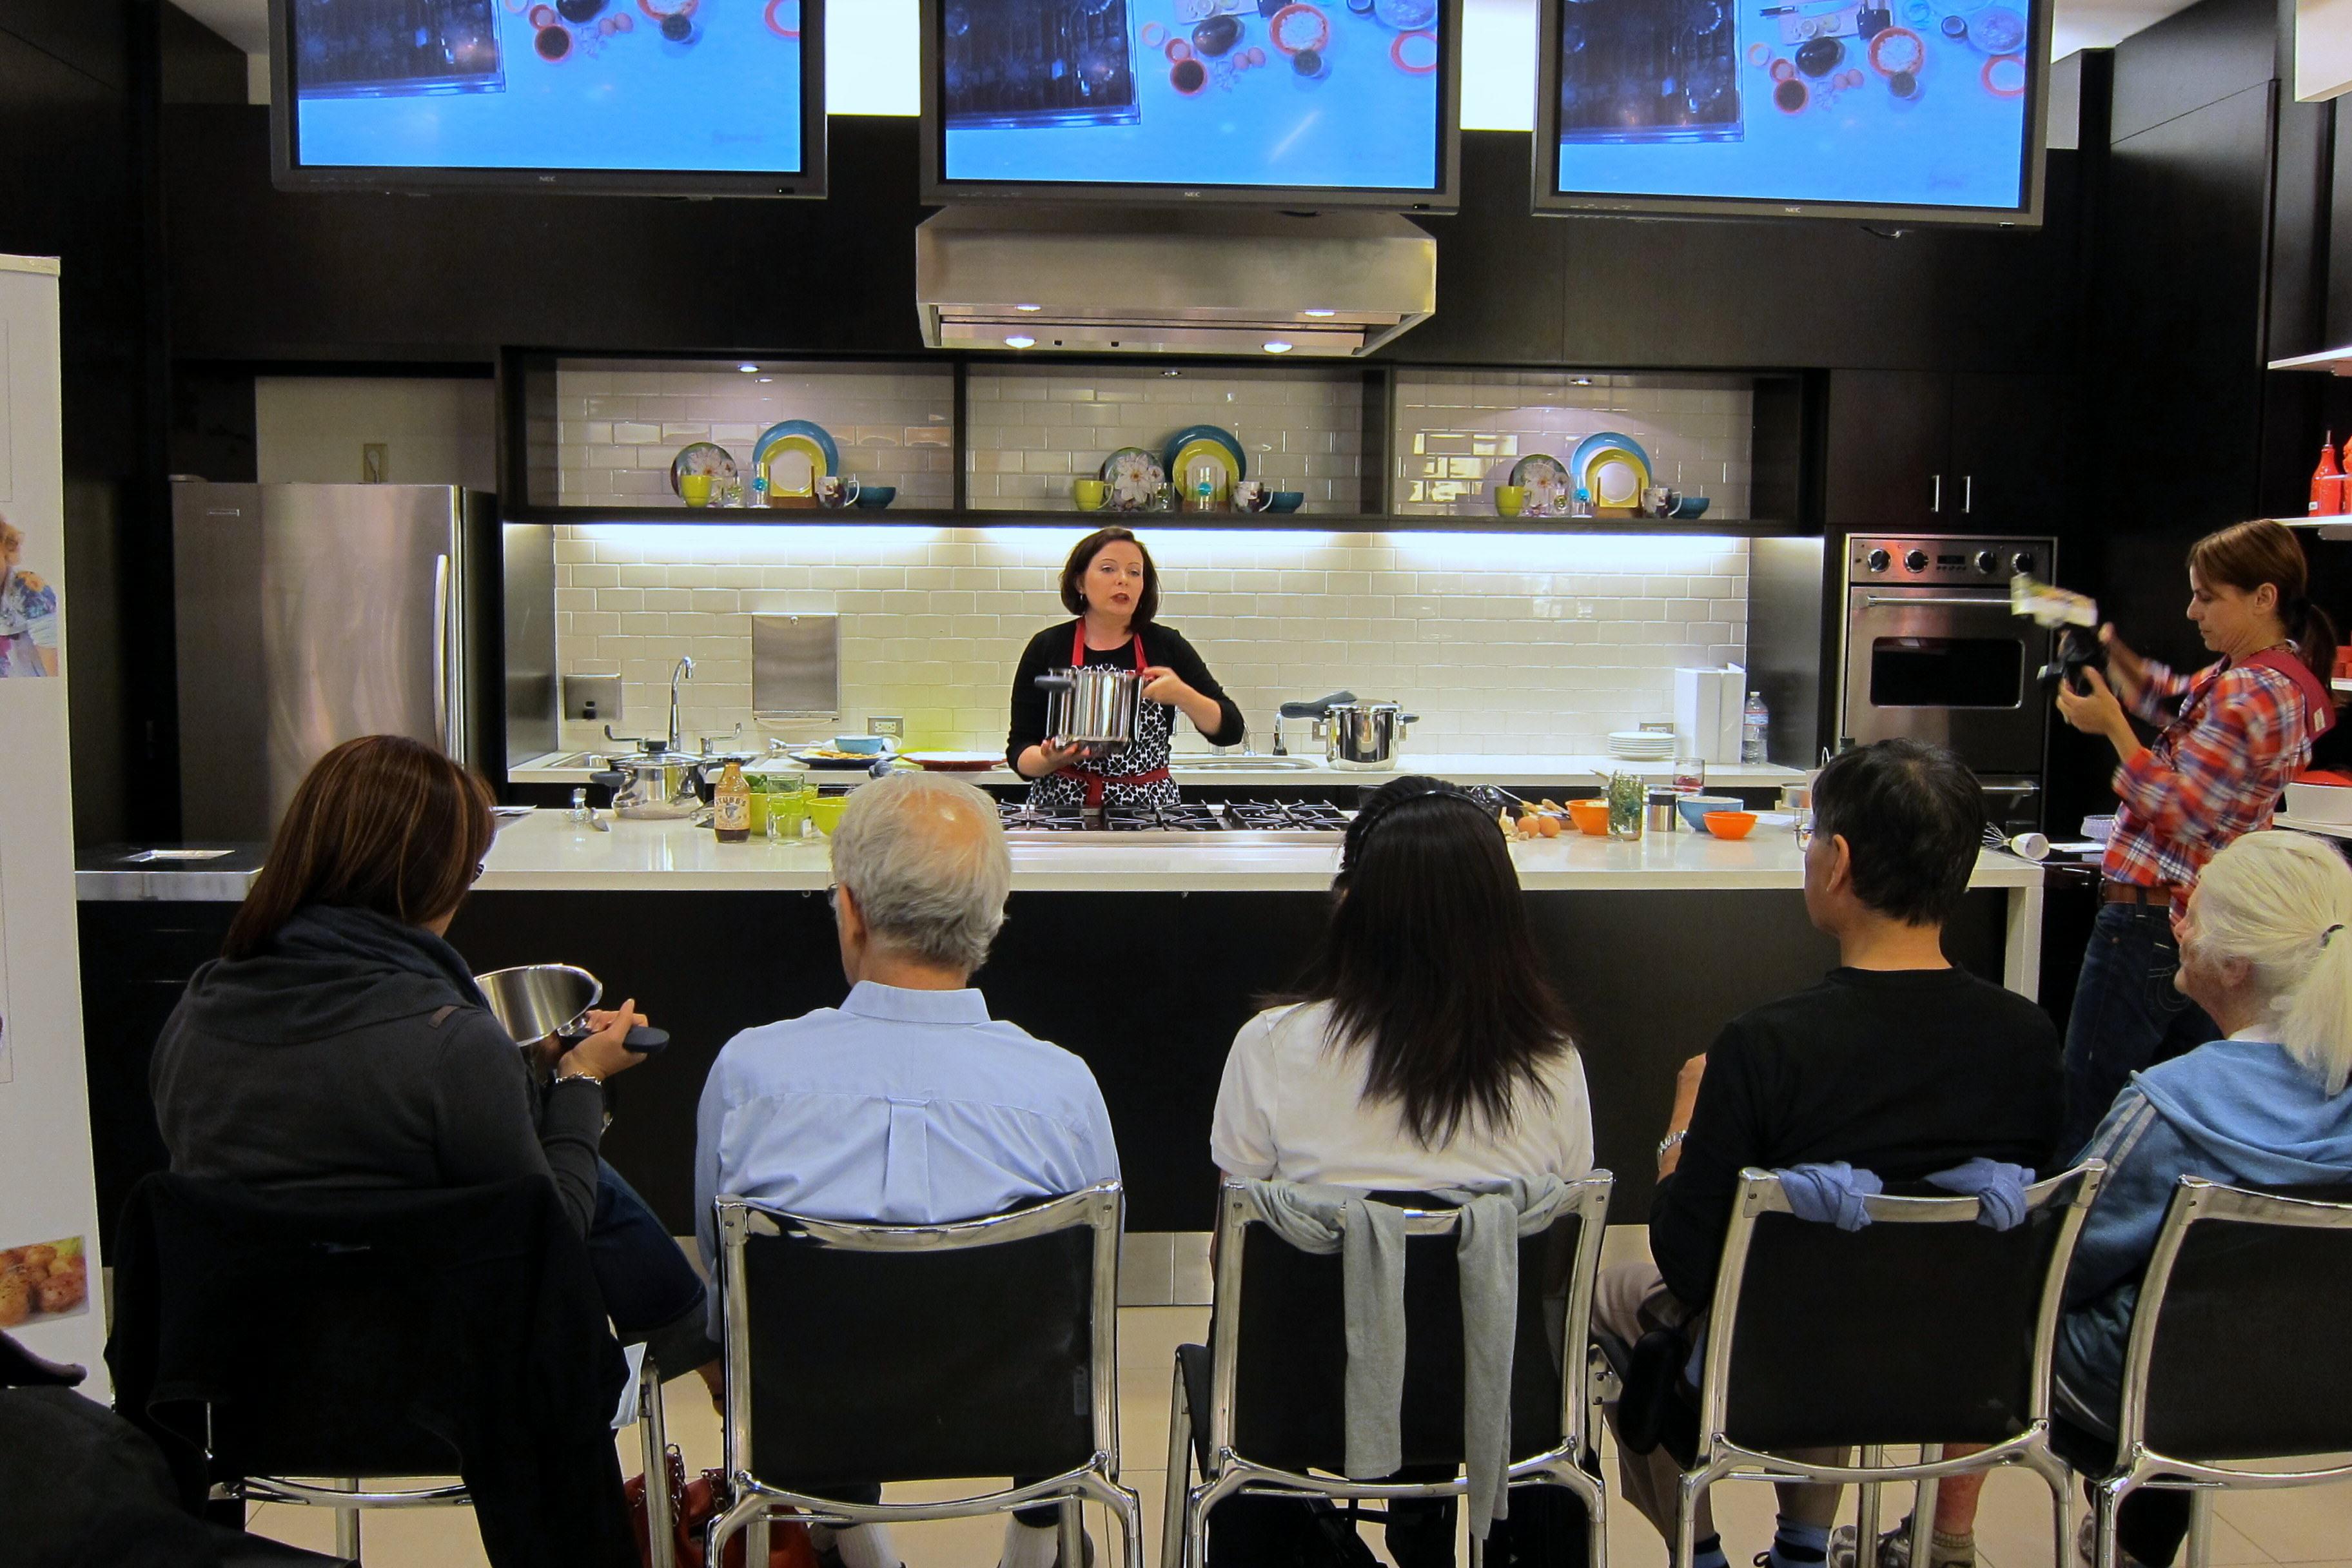 Bloomingdale's Demo Kitchen in San Francisco